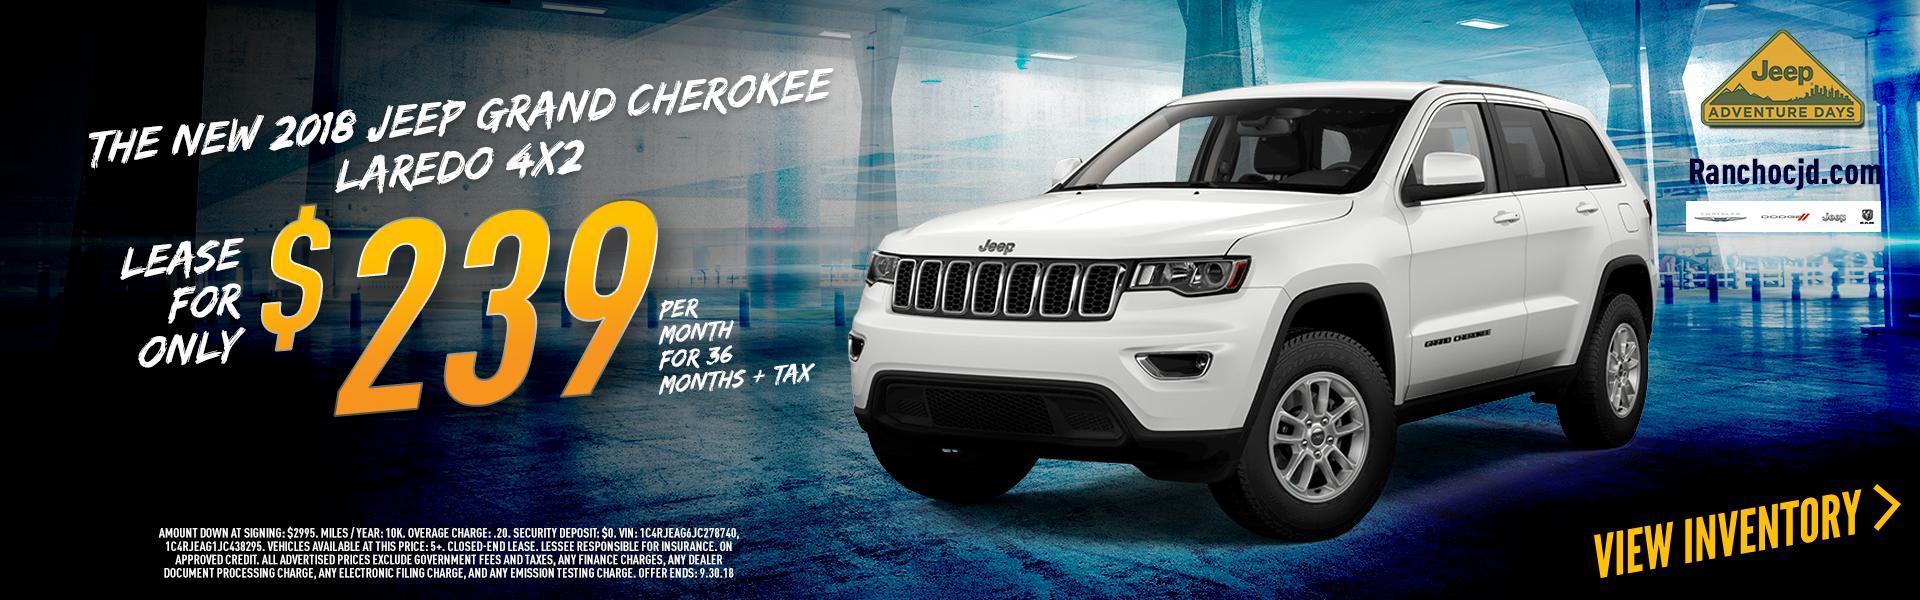 2018-jeep-grand-cherokee-laredo-4x2